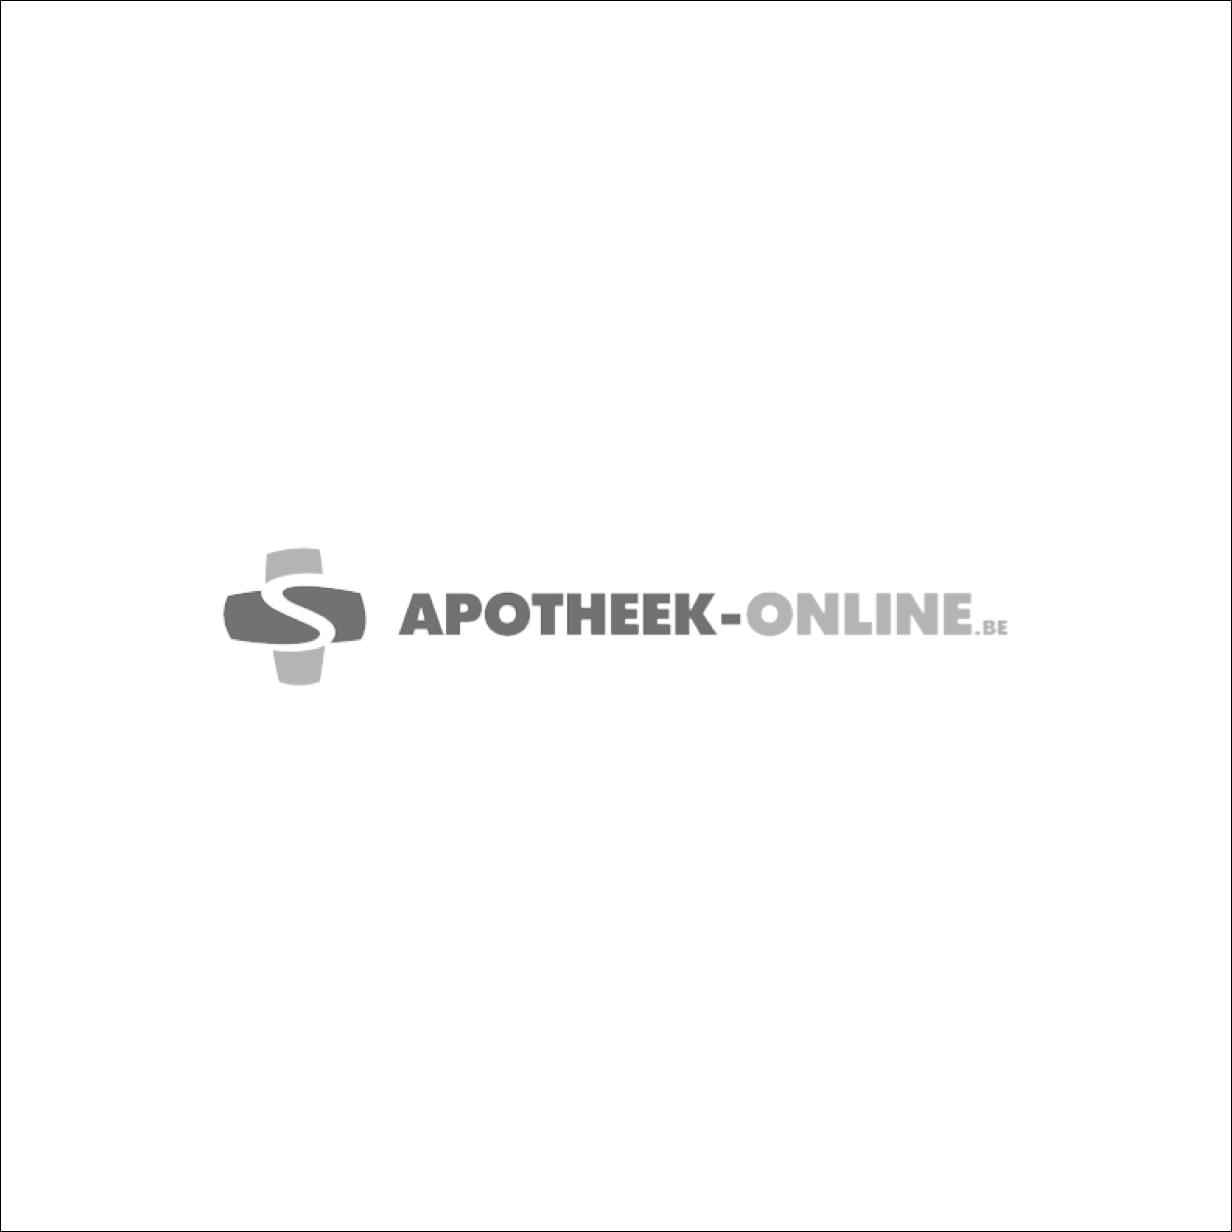 Euphon Sirop pour la Toux Flacon 200ml